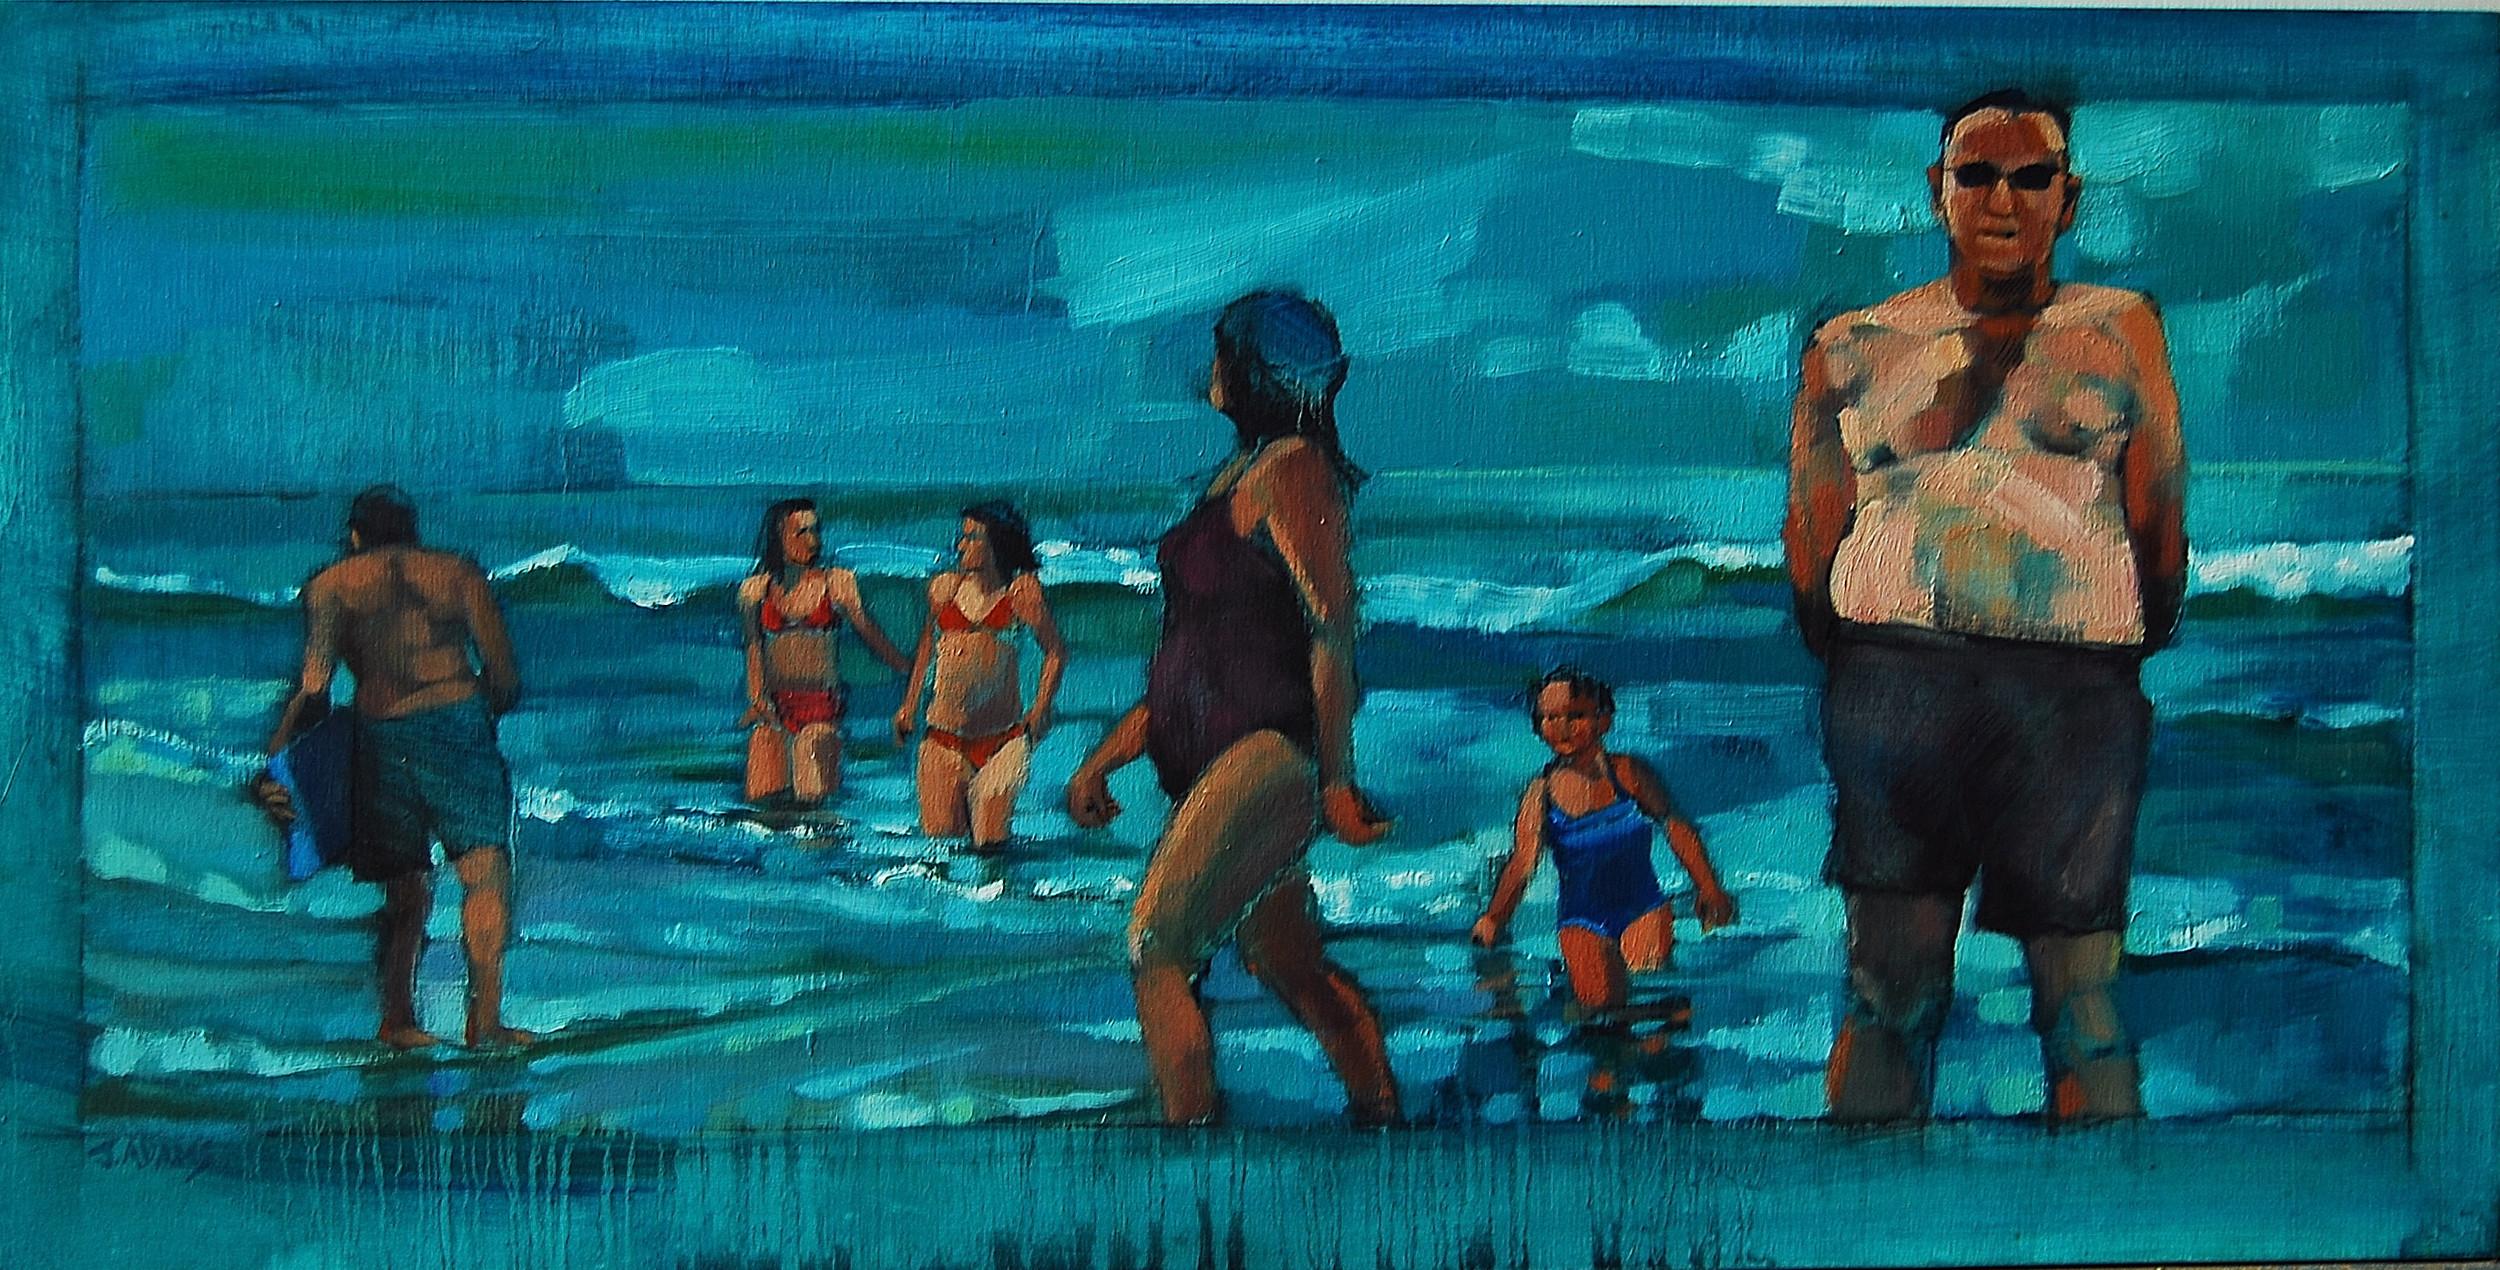 Water's Edge, oil on panel, 12x24, 2009